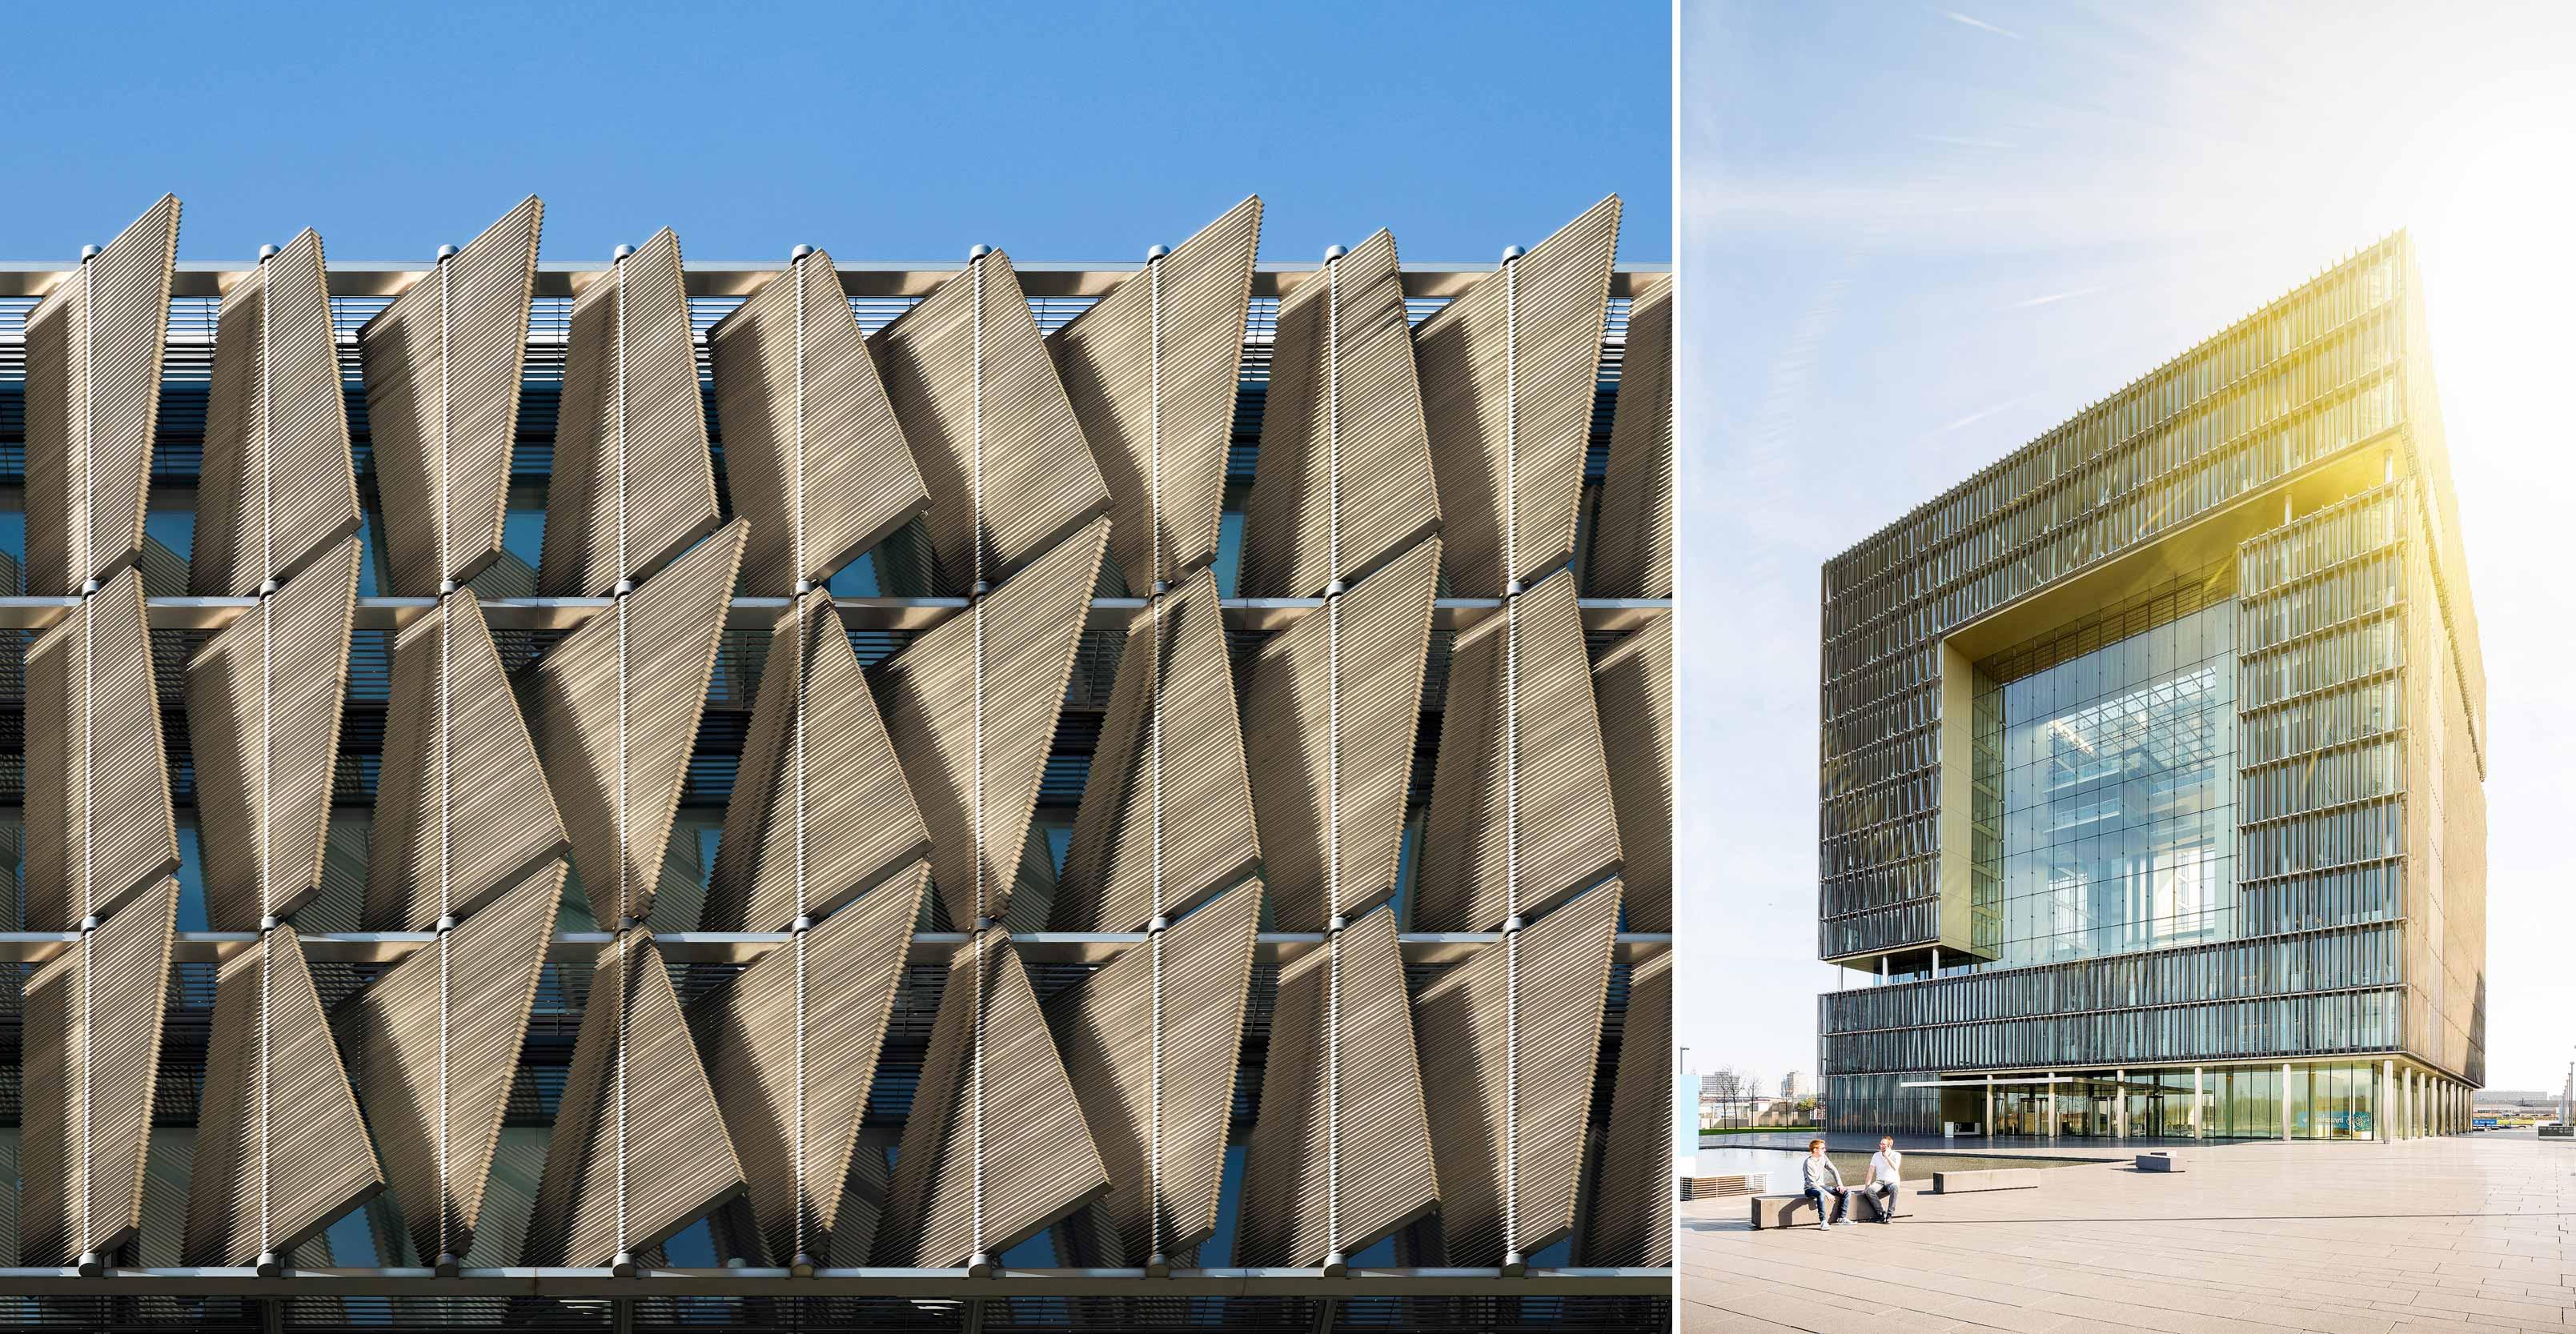 Thyssenkrupp Office Building architecture photographer